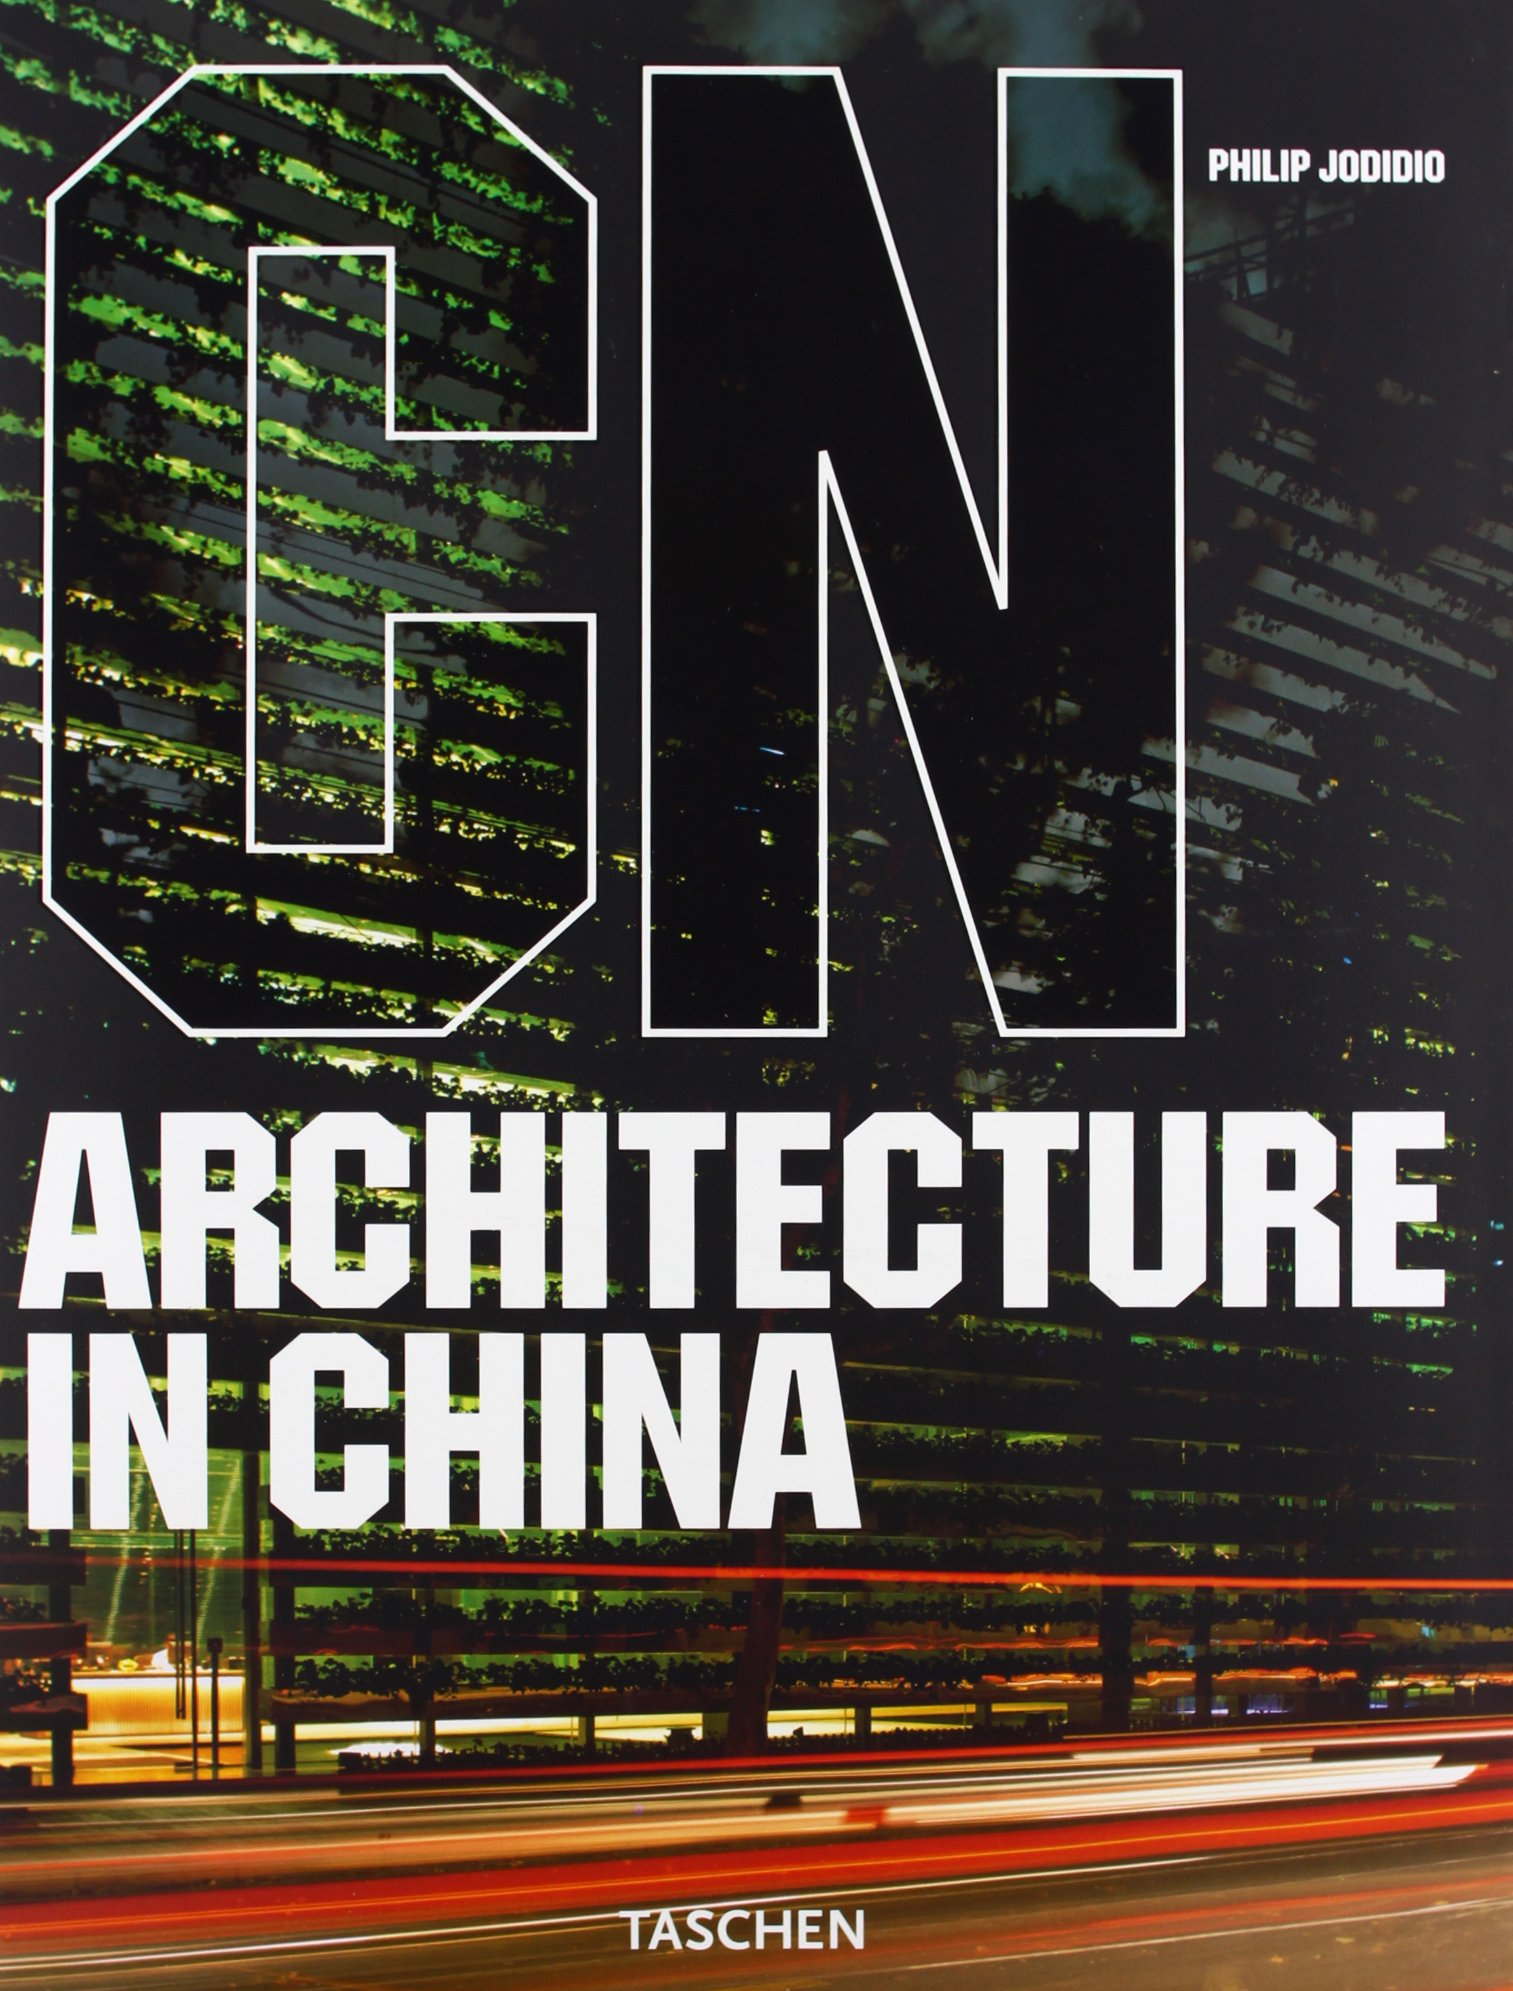 Arquitectura en China (Spagnolo) Copertina rigida – 29 mag 2007 Philip Jodidio Taschen 3822852635 BOG_LIB_U_001850